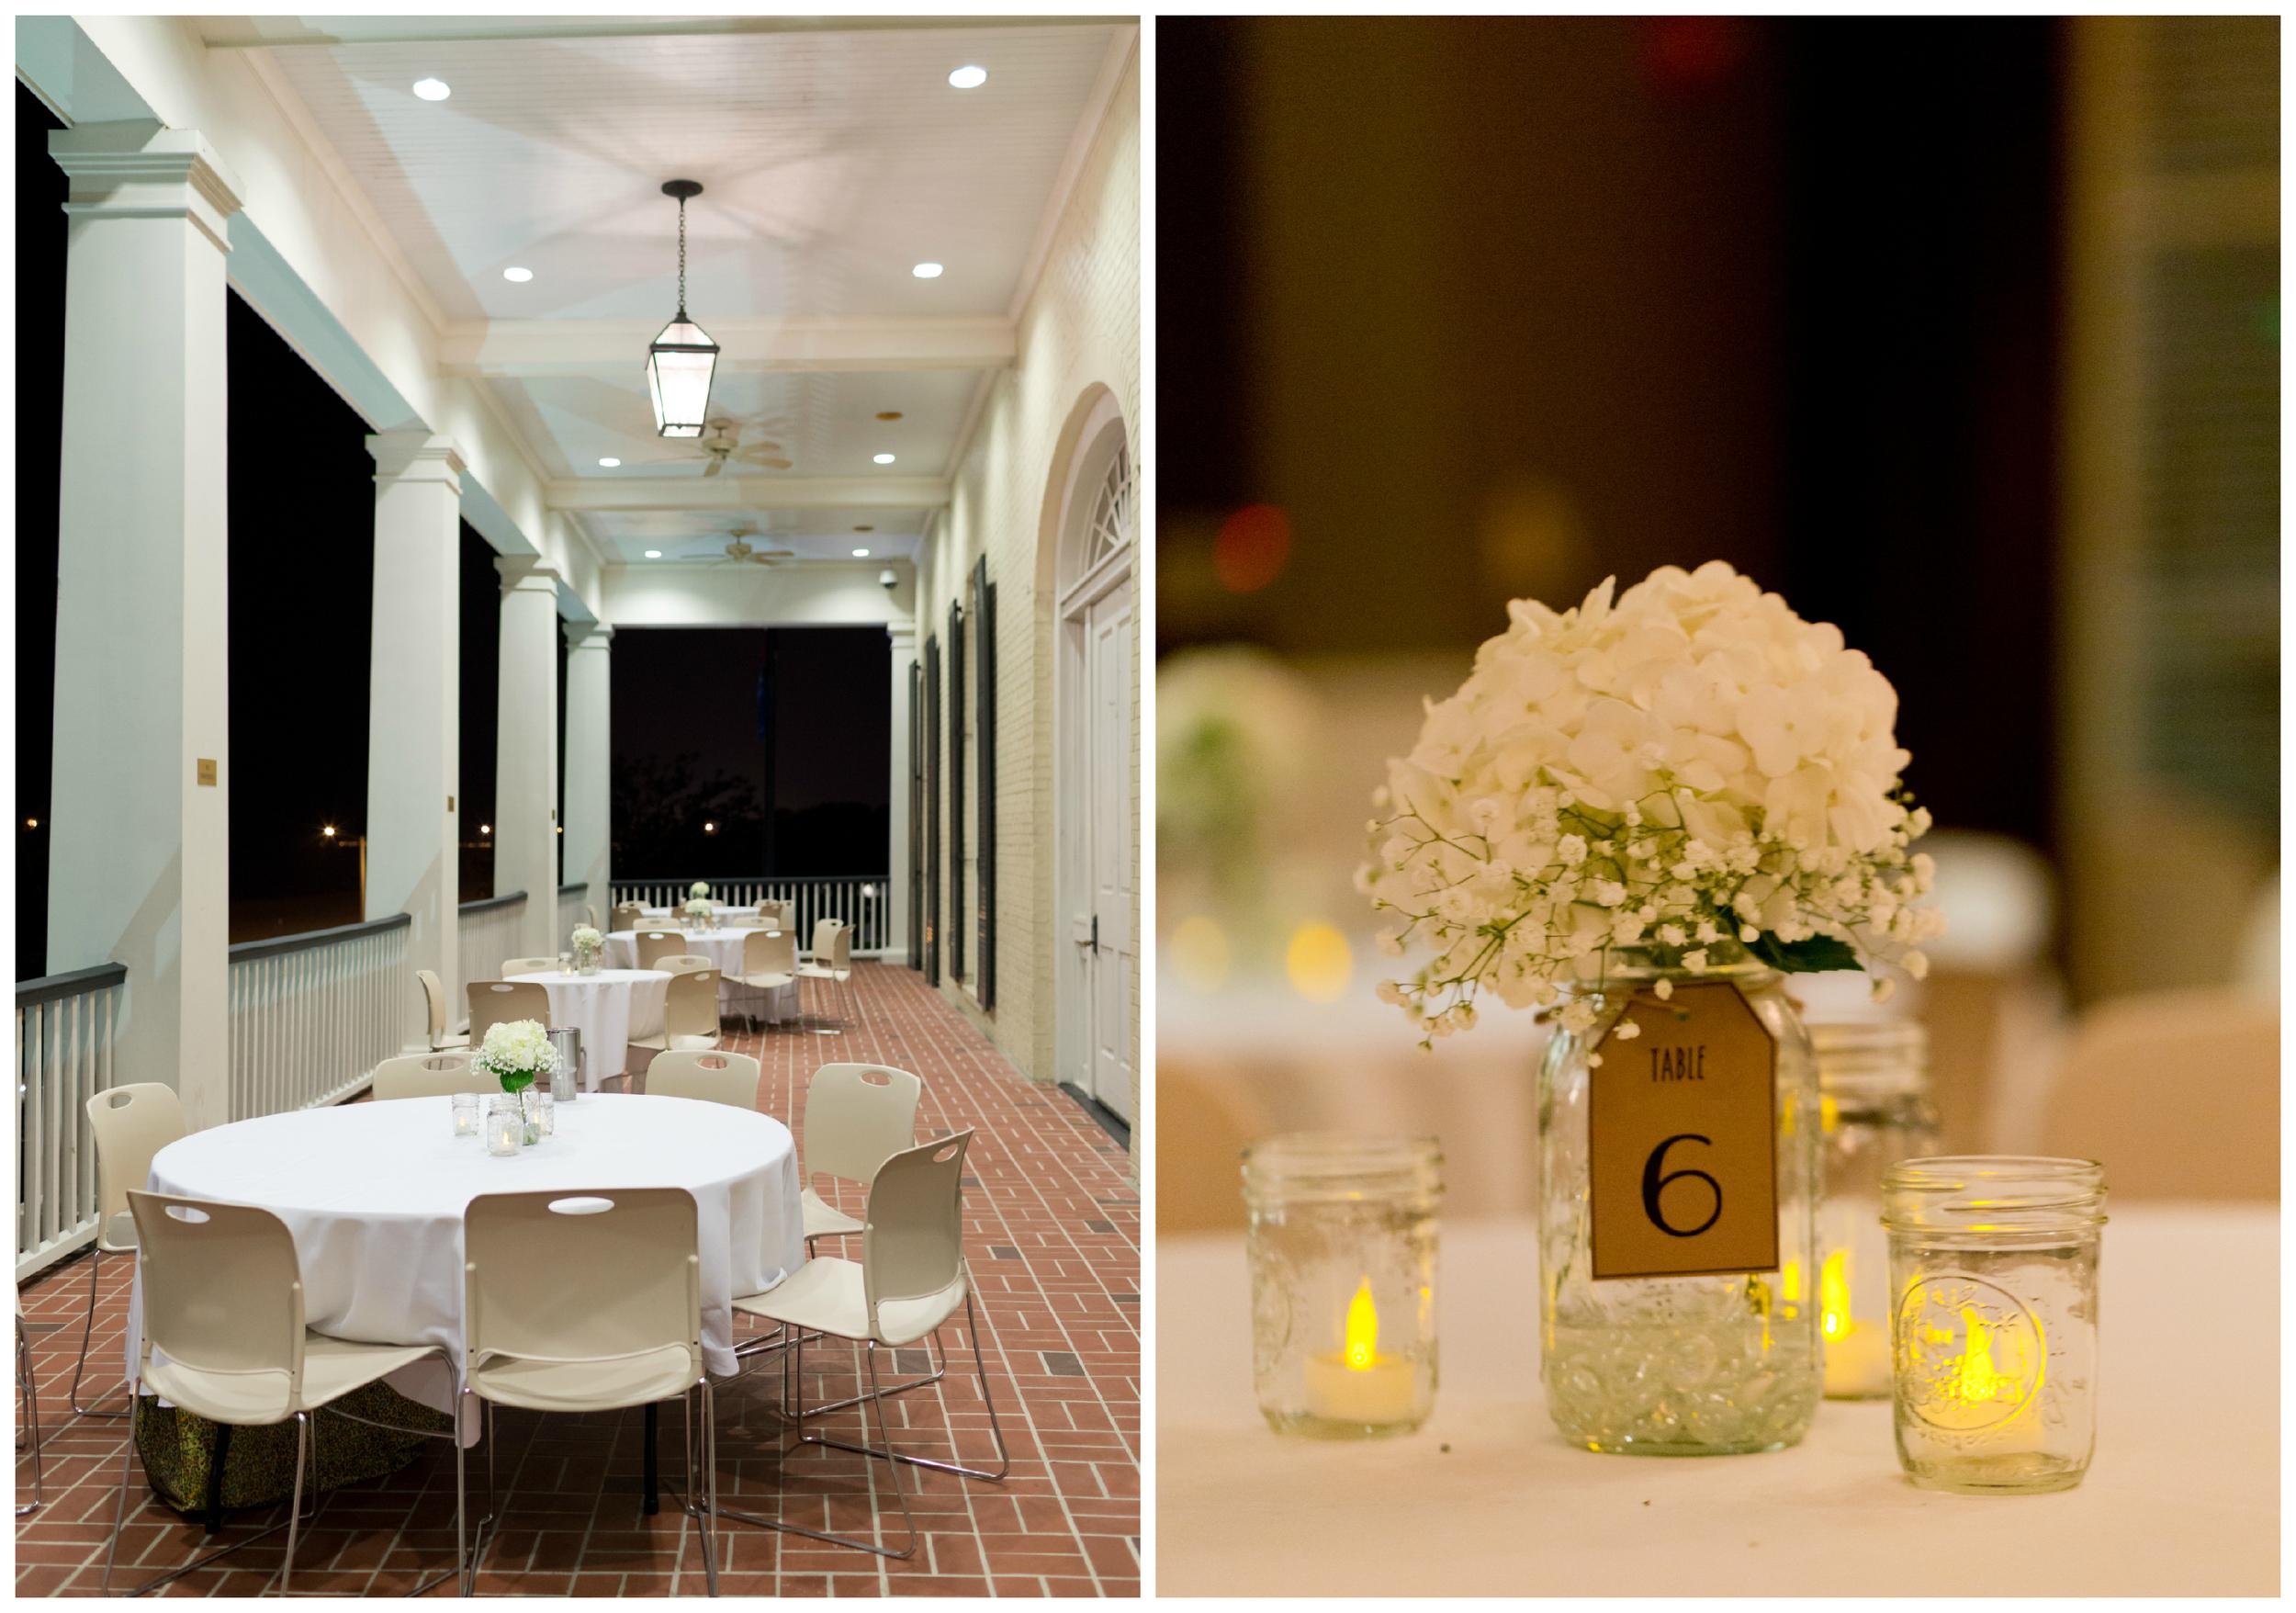 wedding reception table decor with white hydrangeas, mason jars